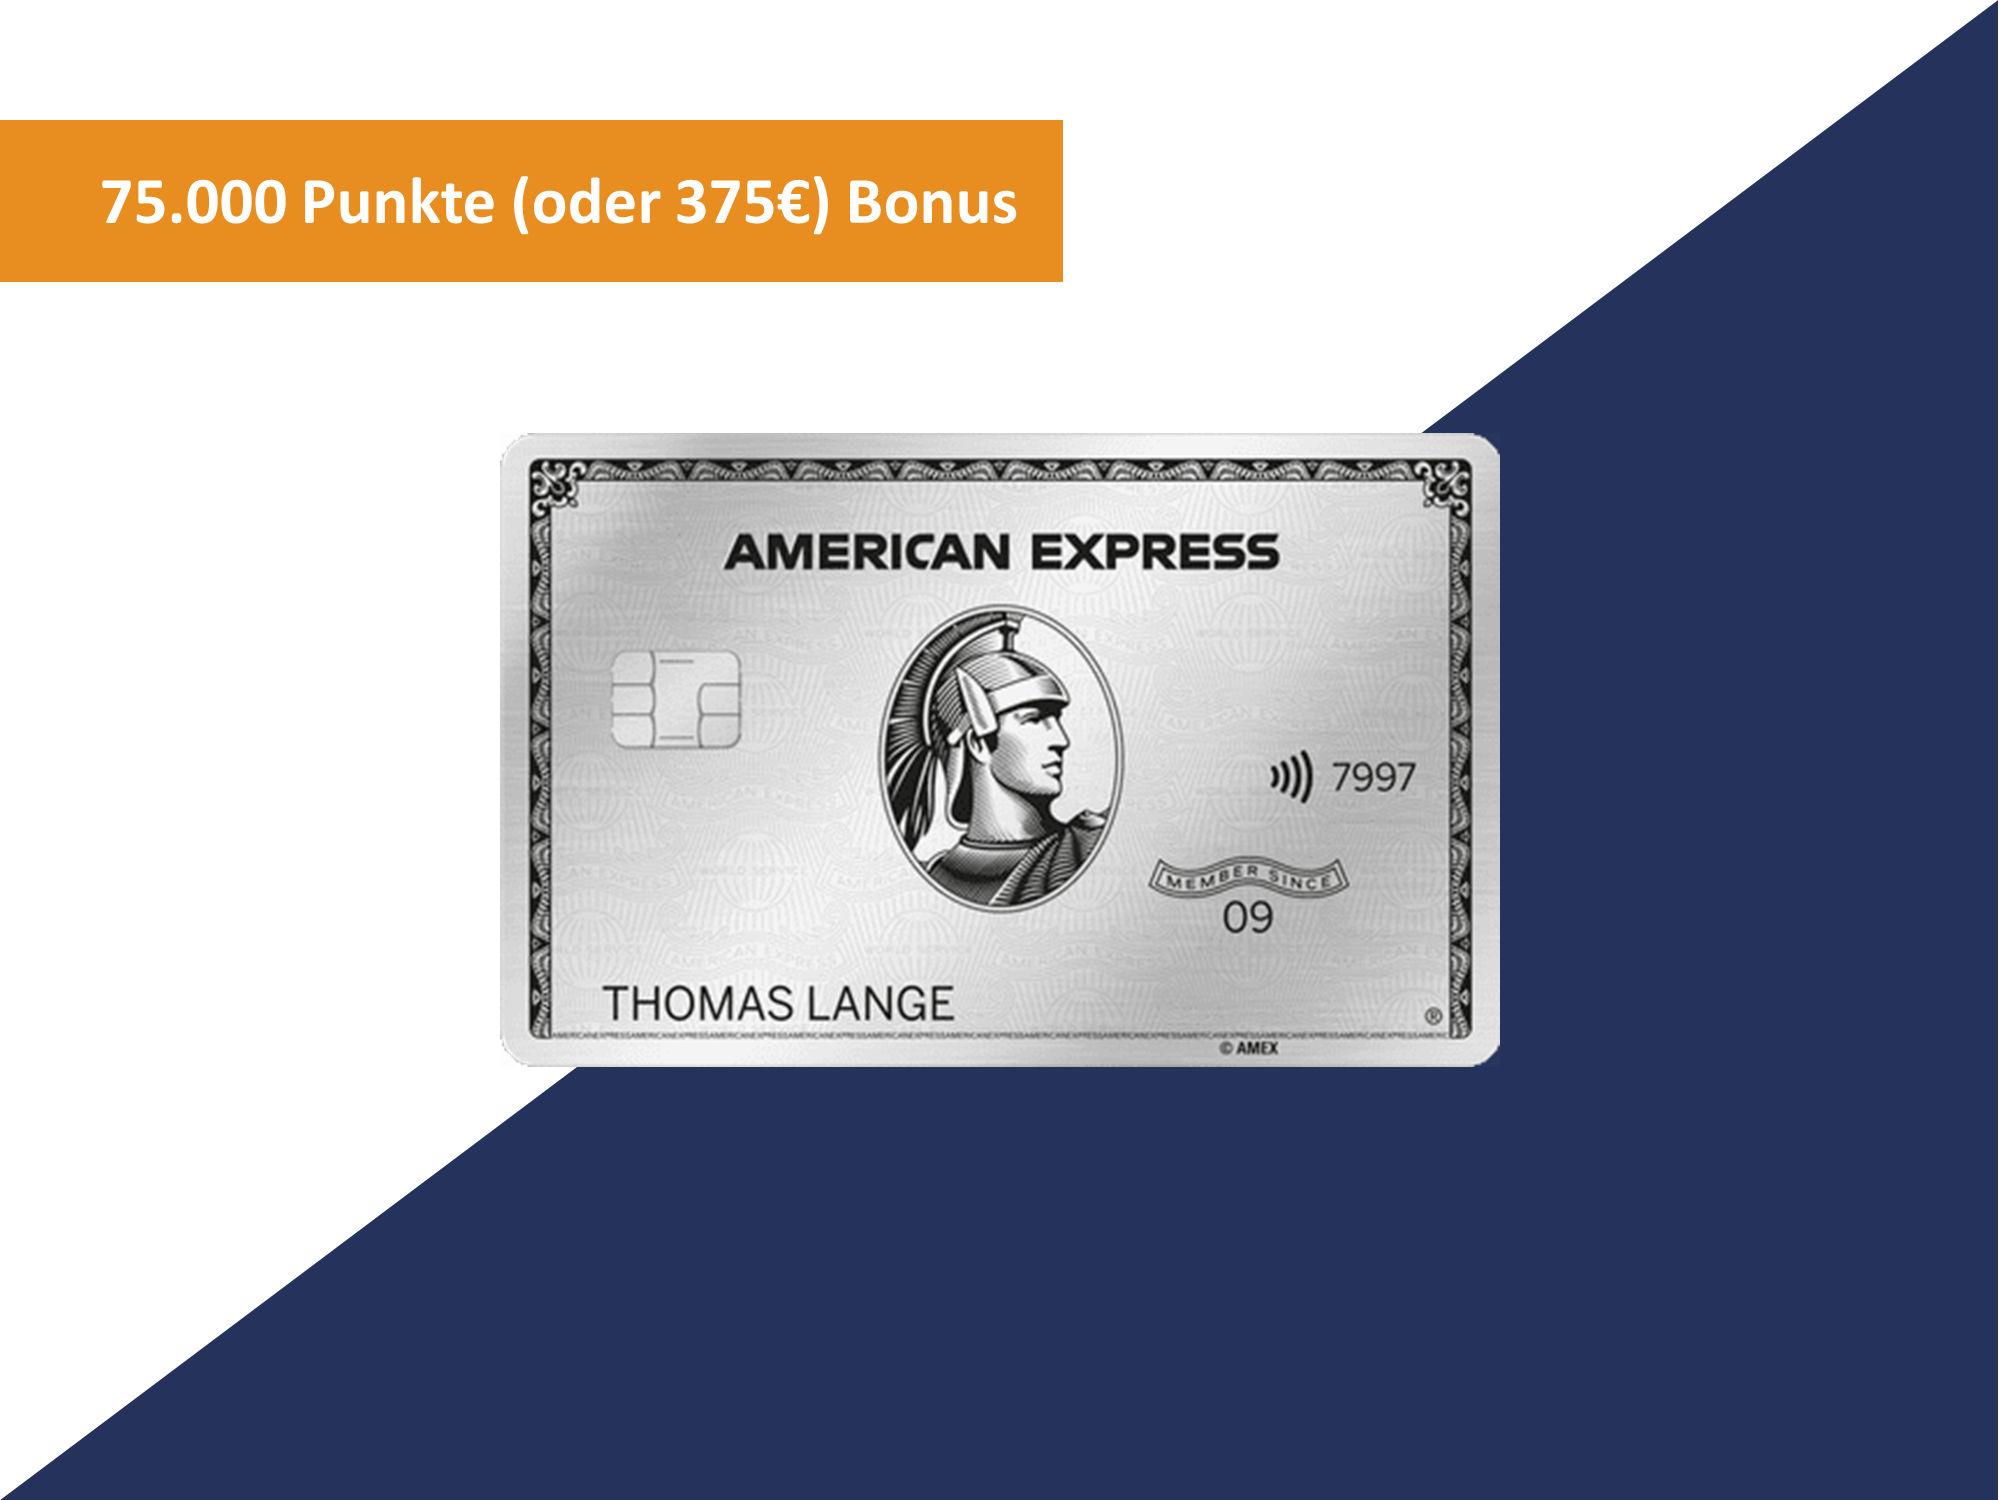 American Express Platinum: 7 Punkte Bonus meilenoptimieren